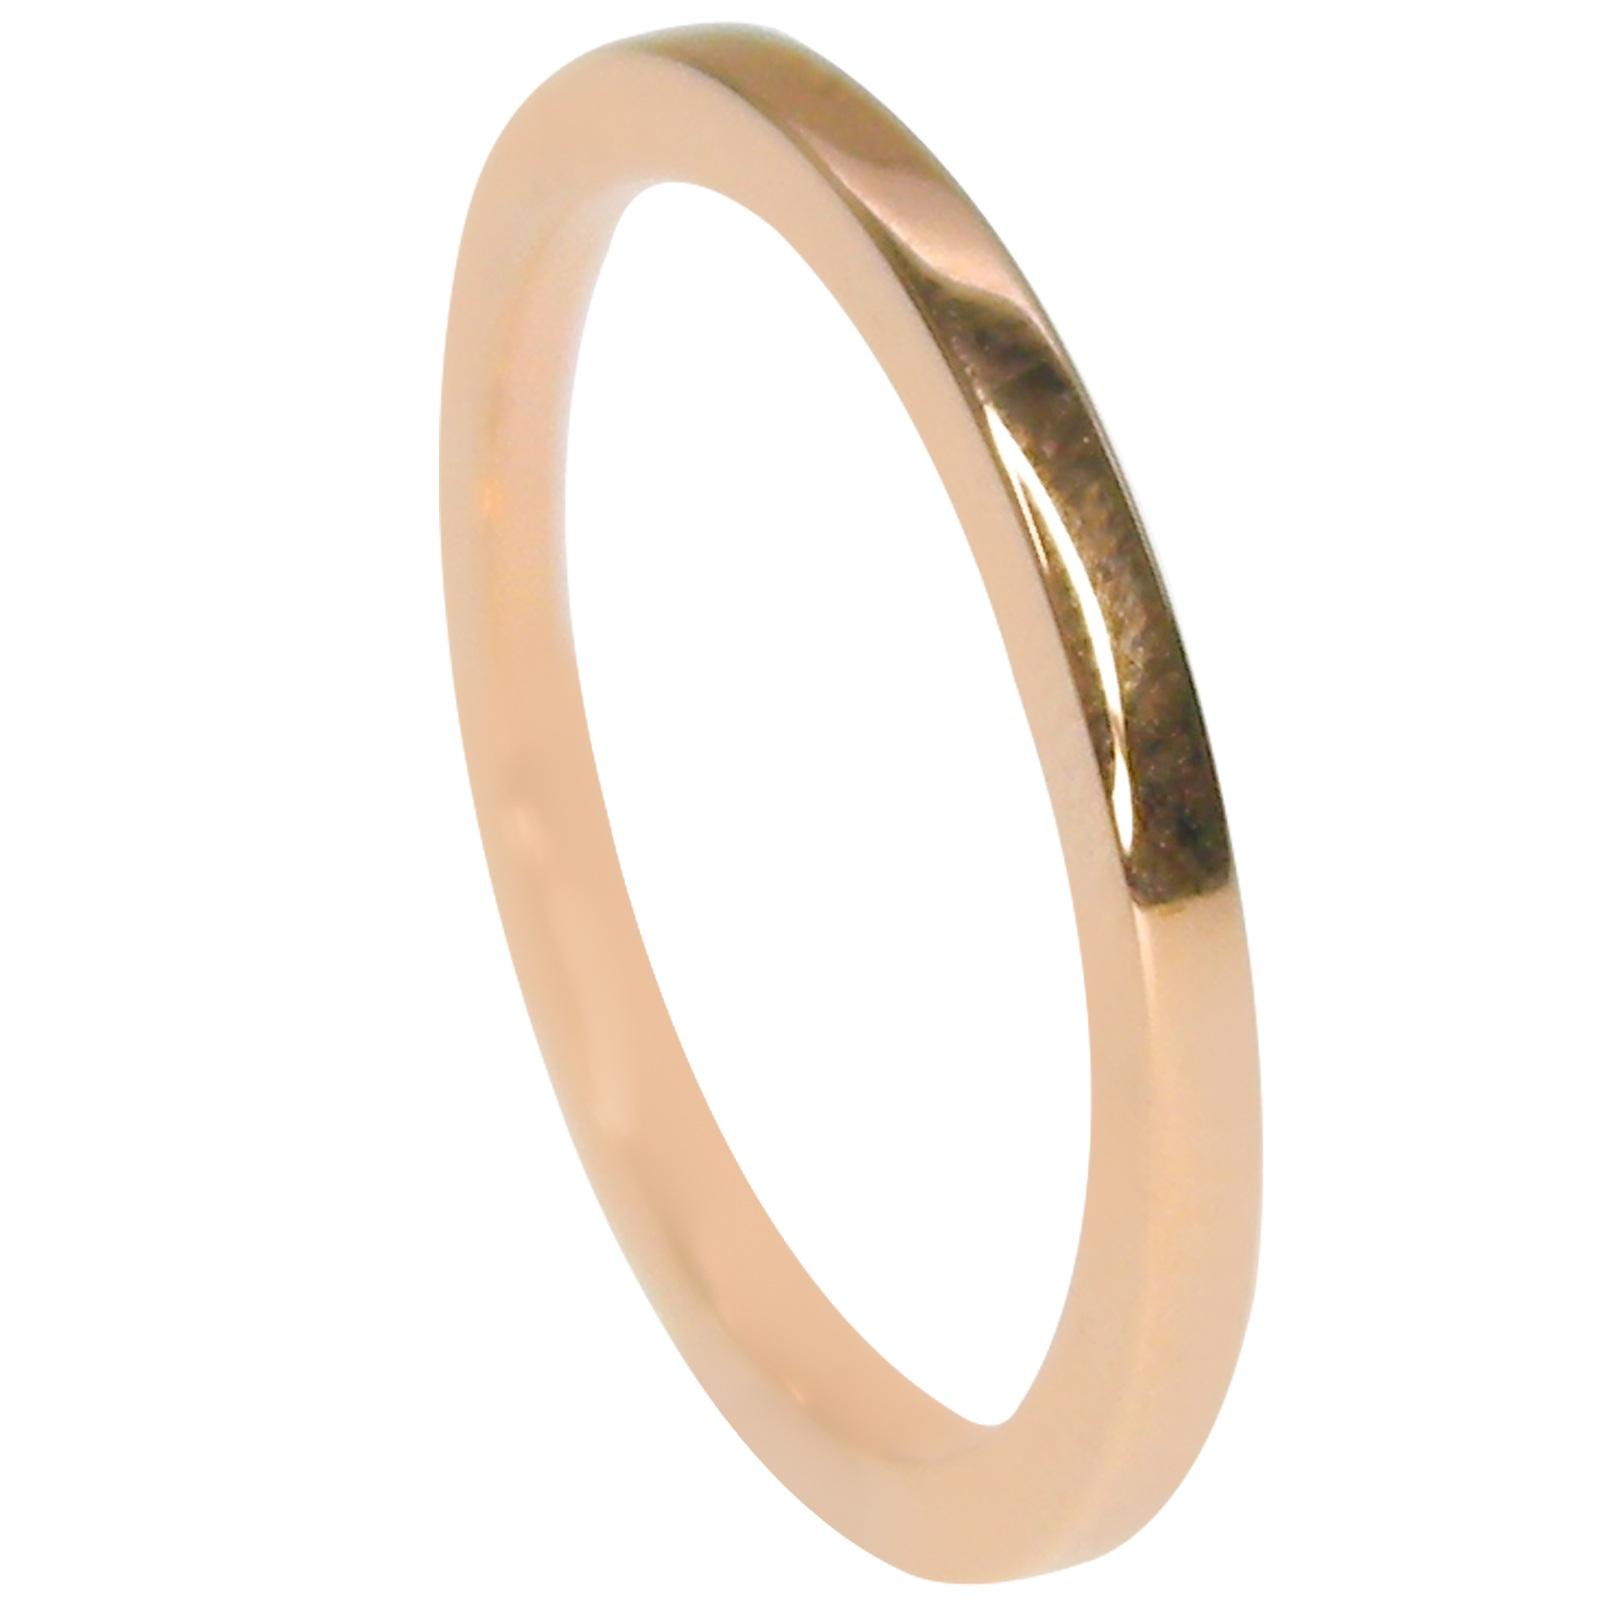 18K ROSE GOLD WEDDING BAND 1.5 mm